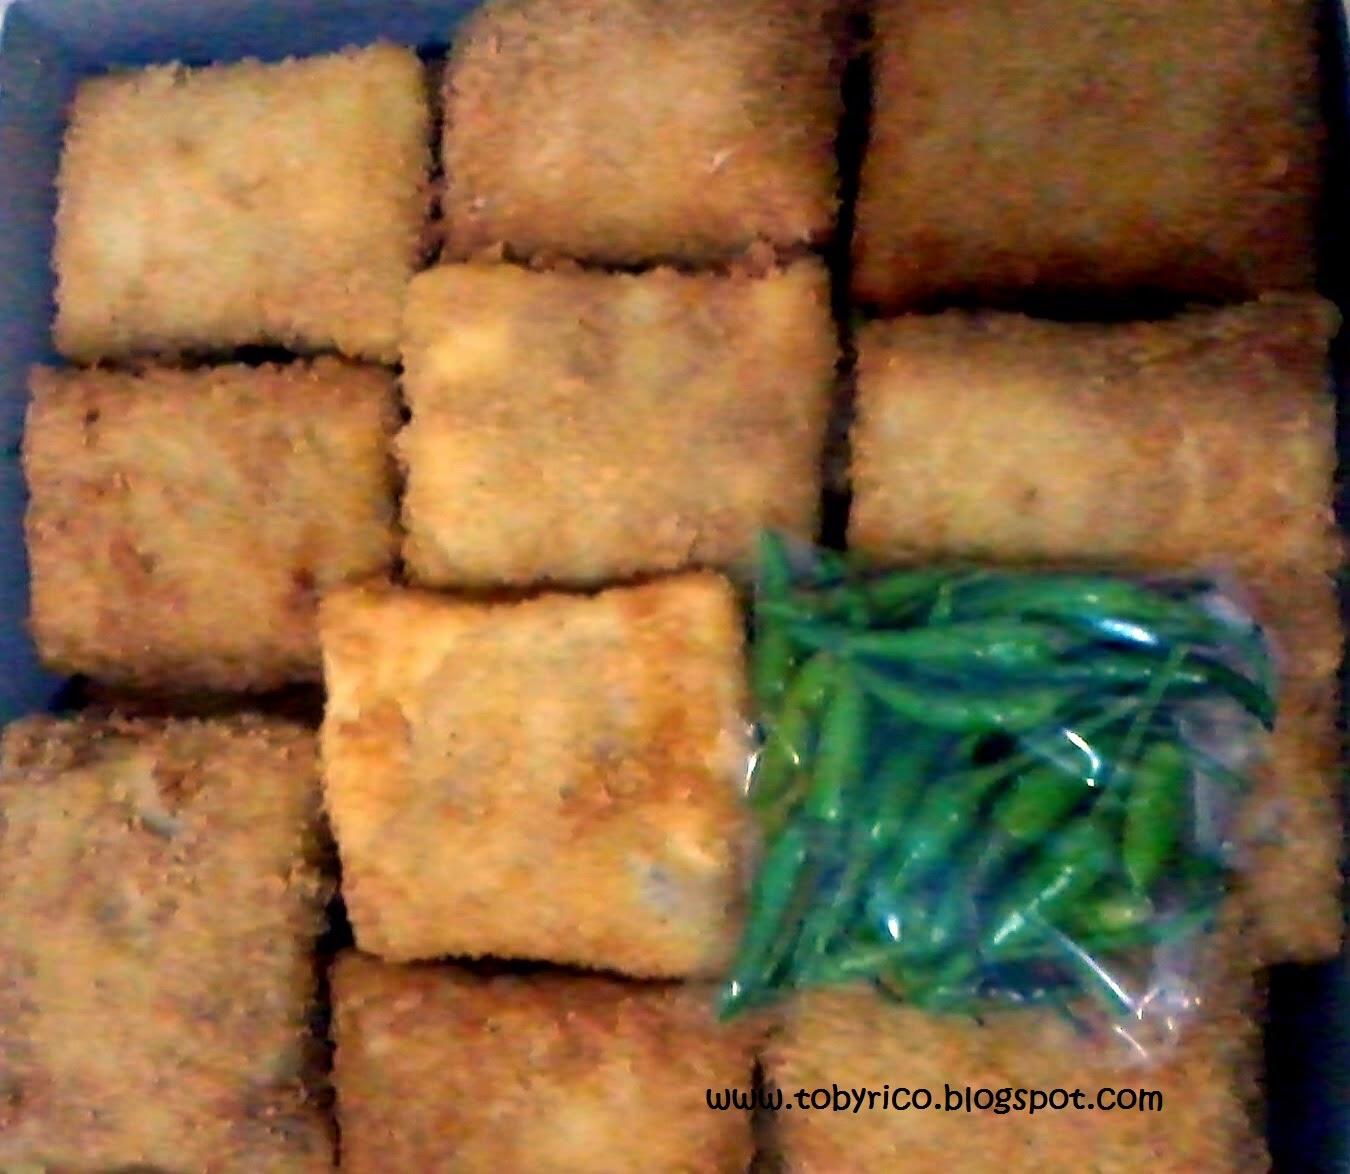 TobyRico's mom' kitchen : American Risoles for Une